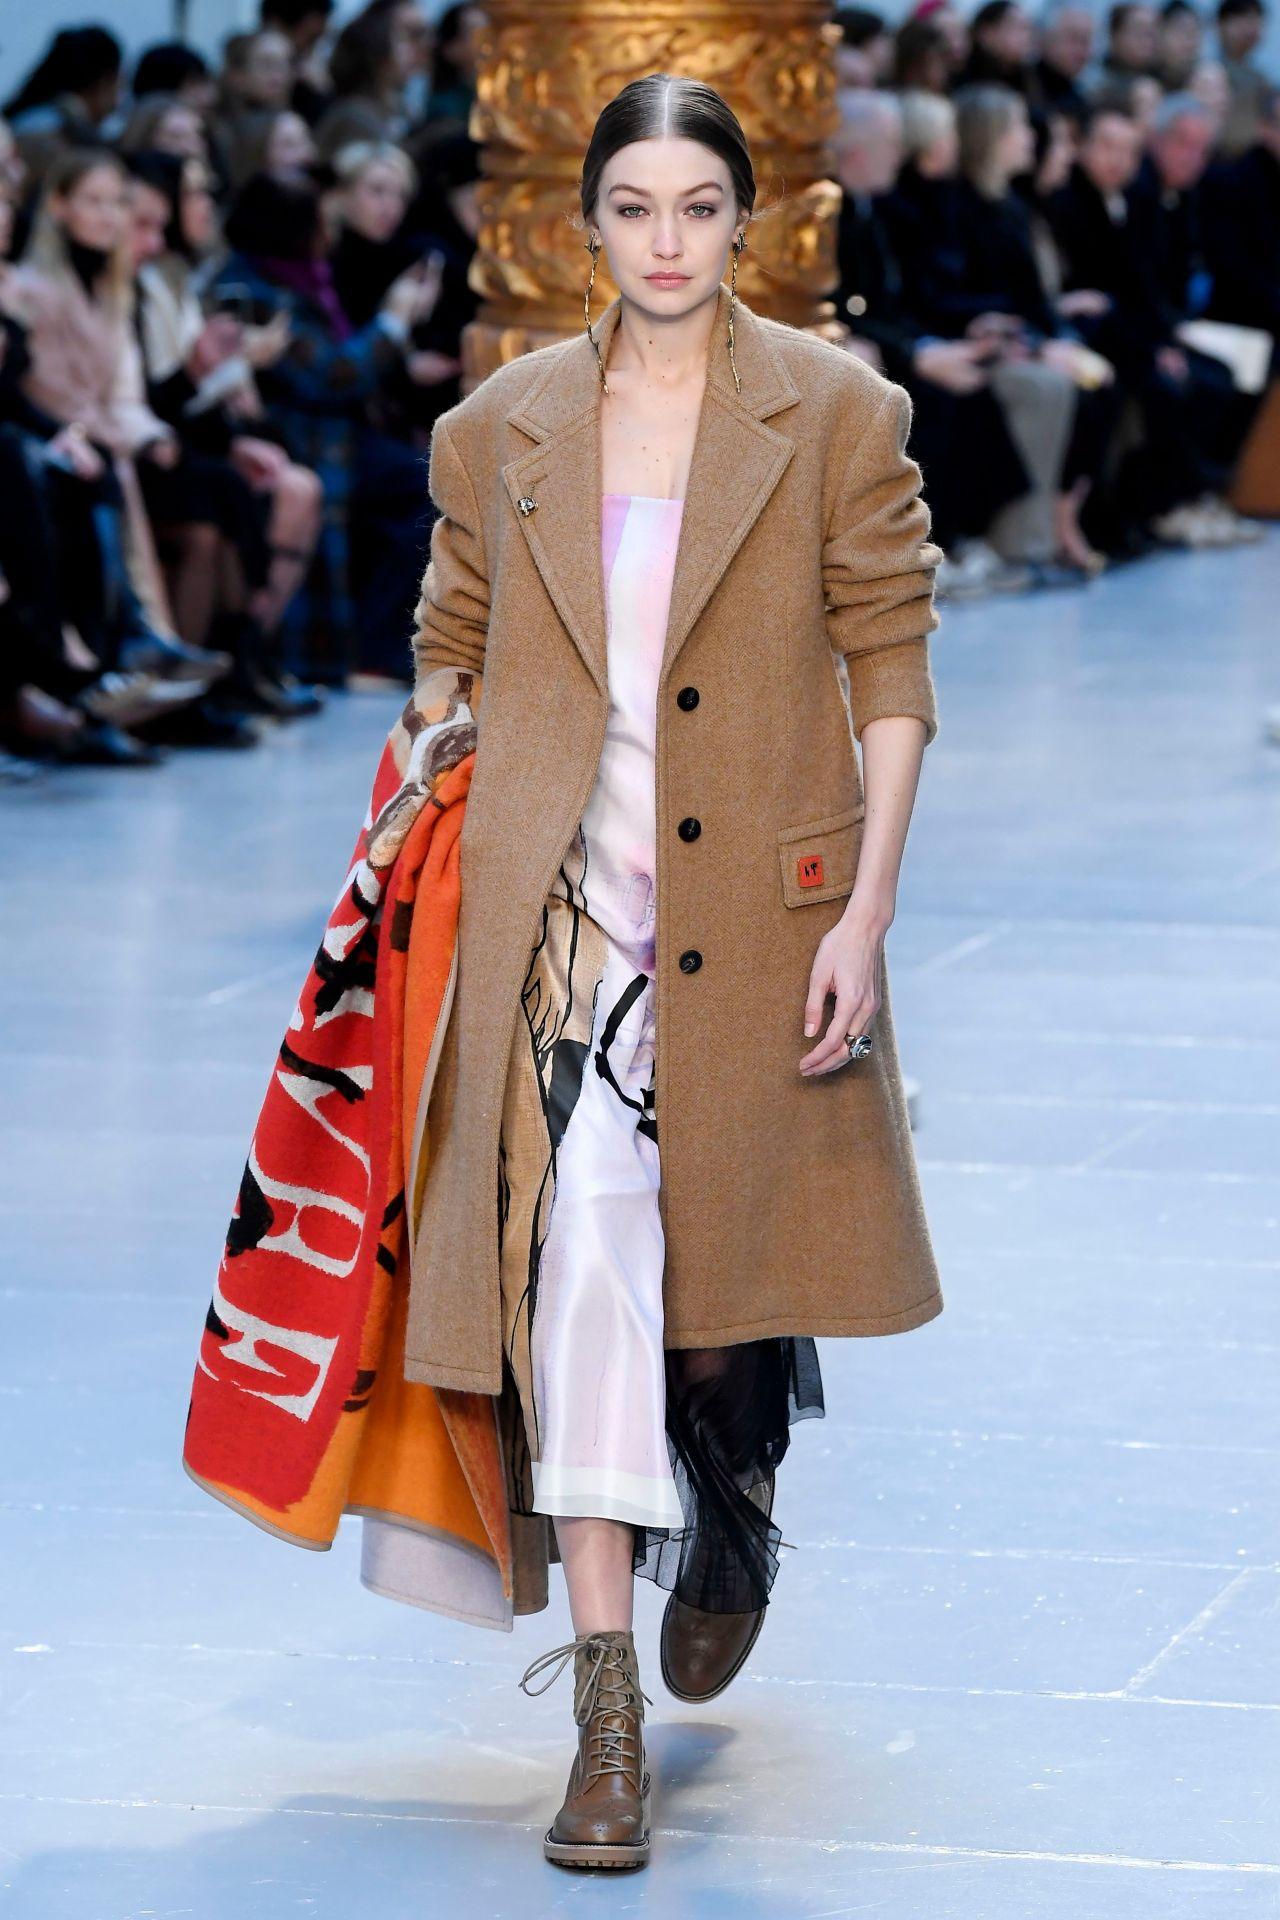 gigi-hadid-walks-runway-chloe-womenswear-fall-winter-2020-2021